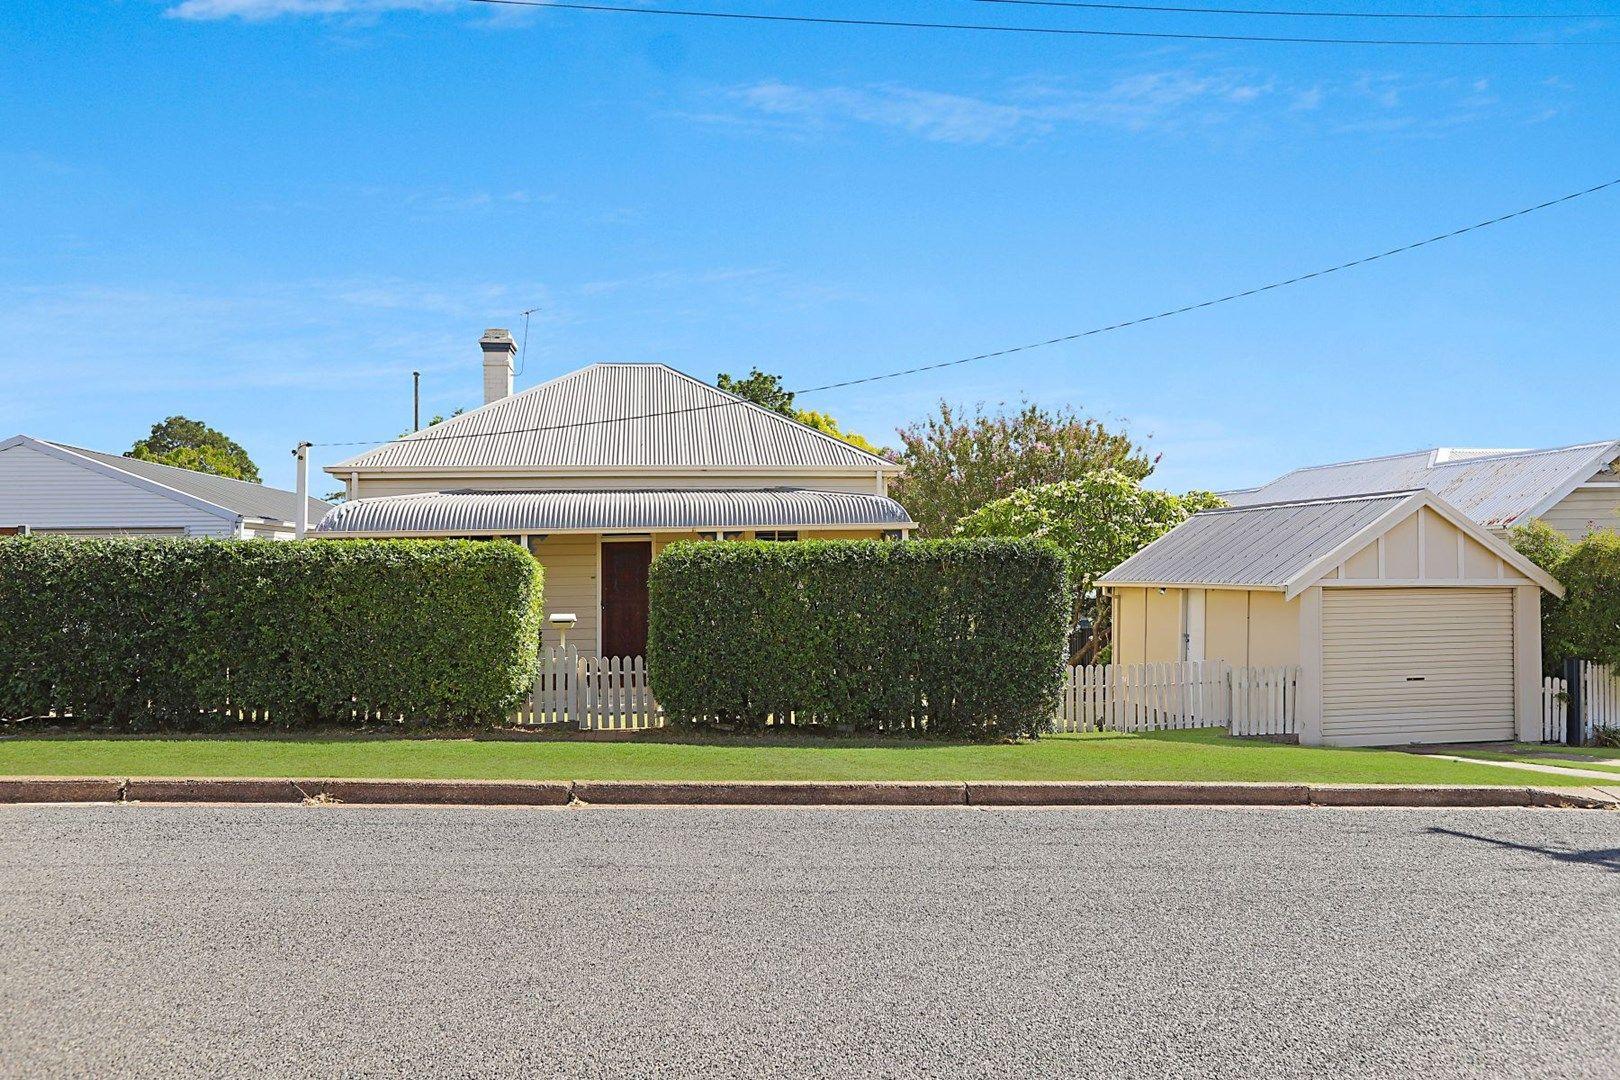 39 ADA STREET, Telarah NSW 2320, Image 0